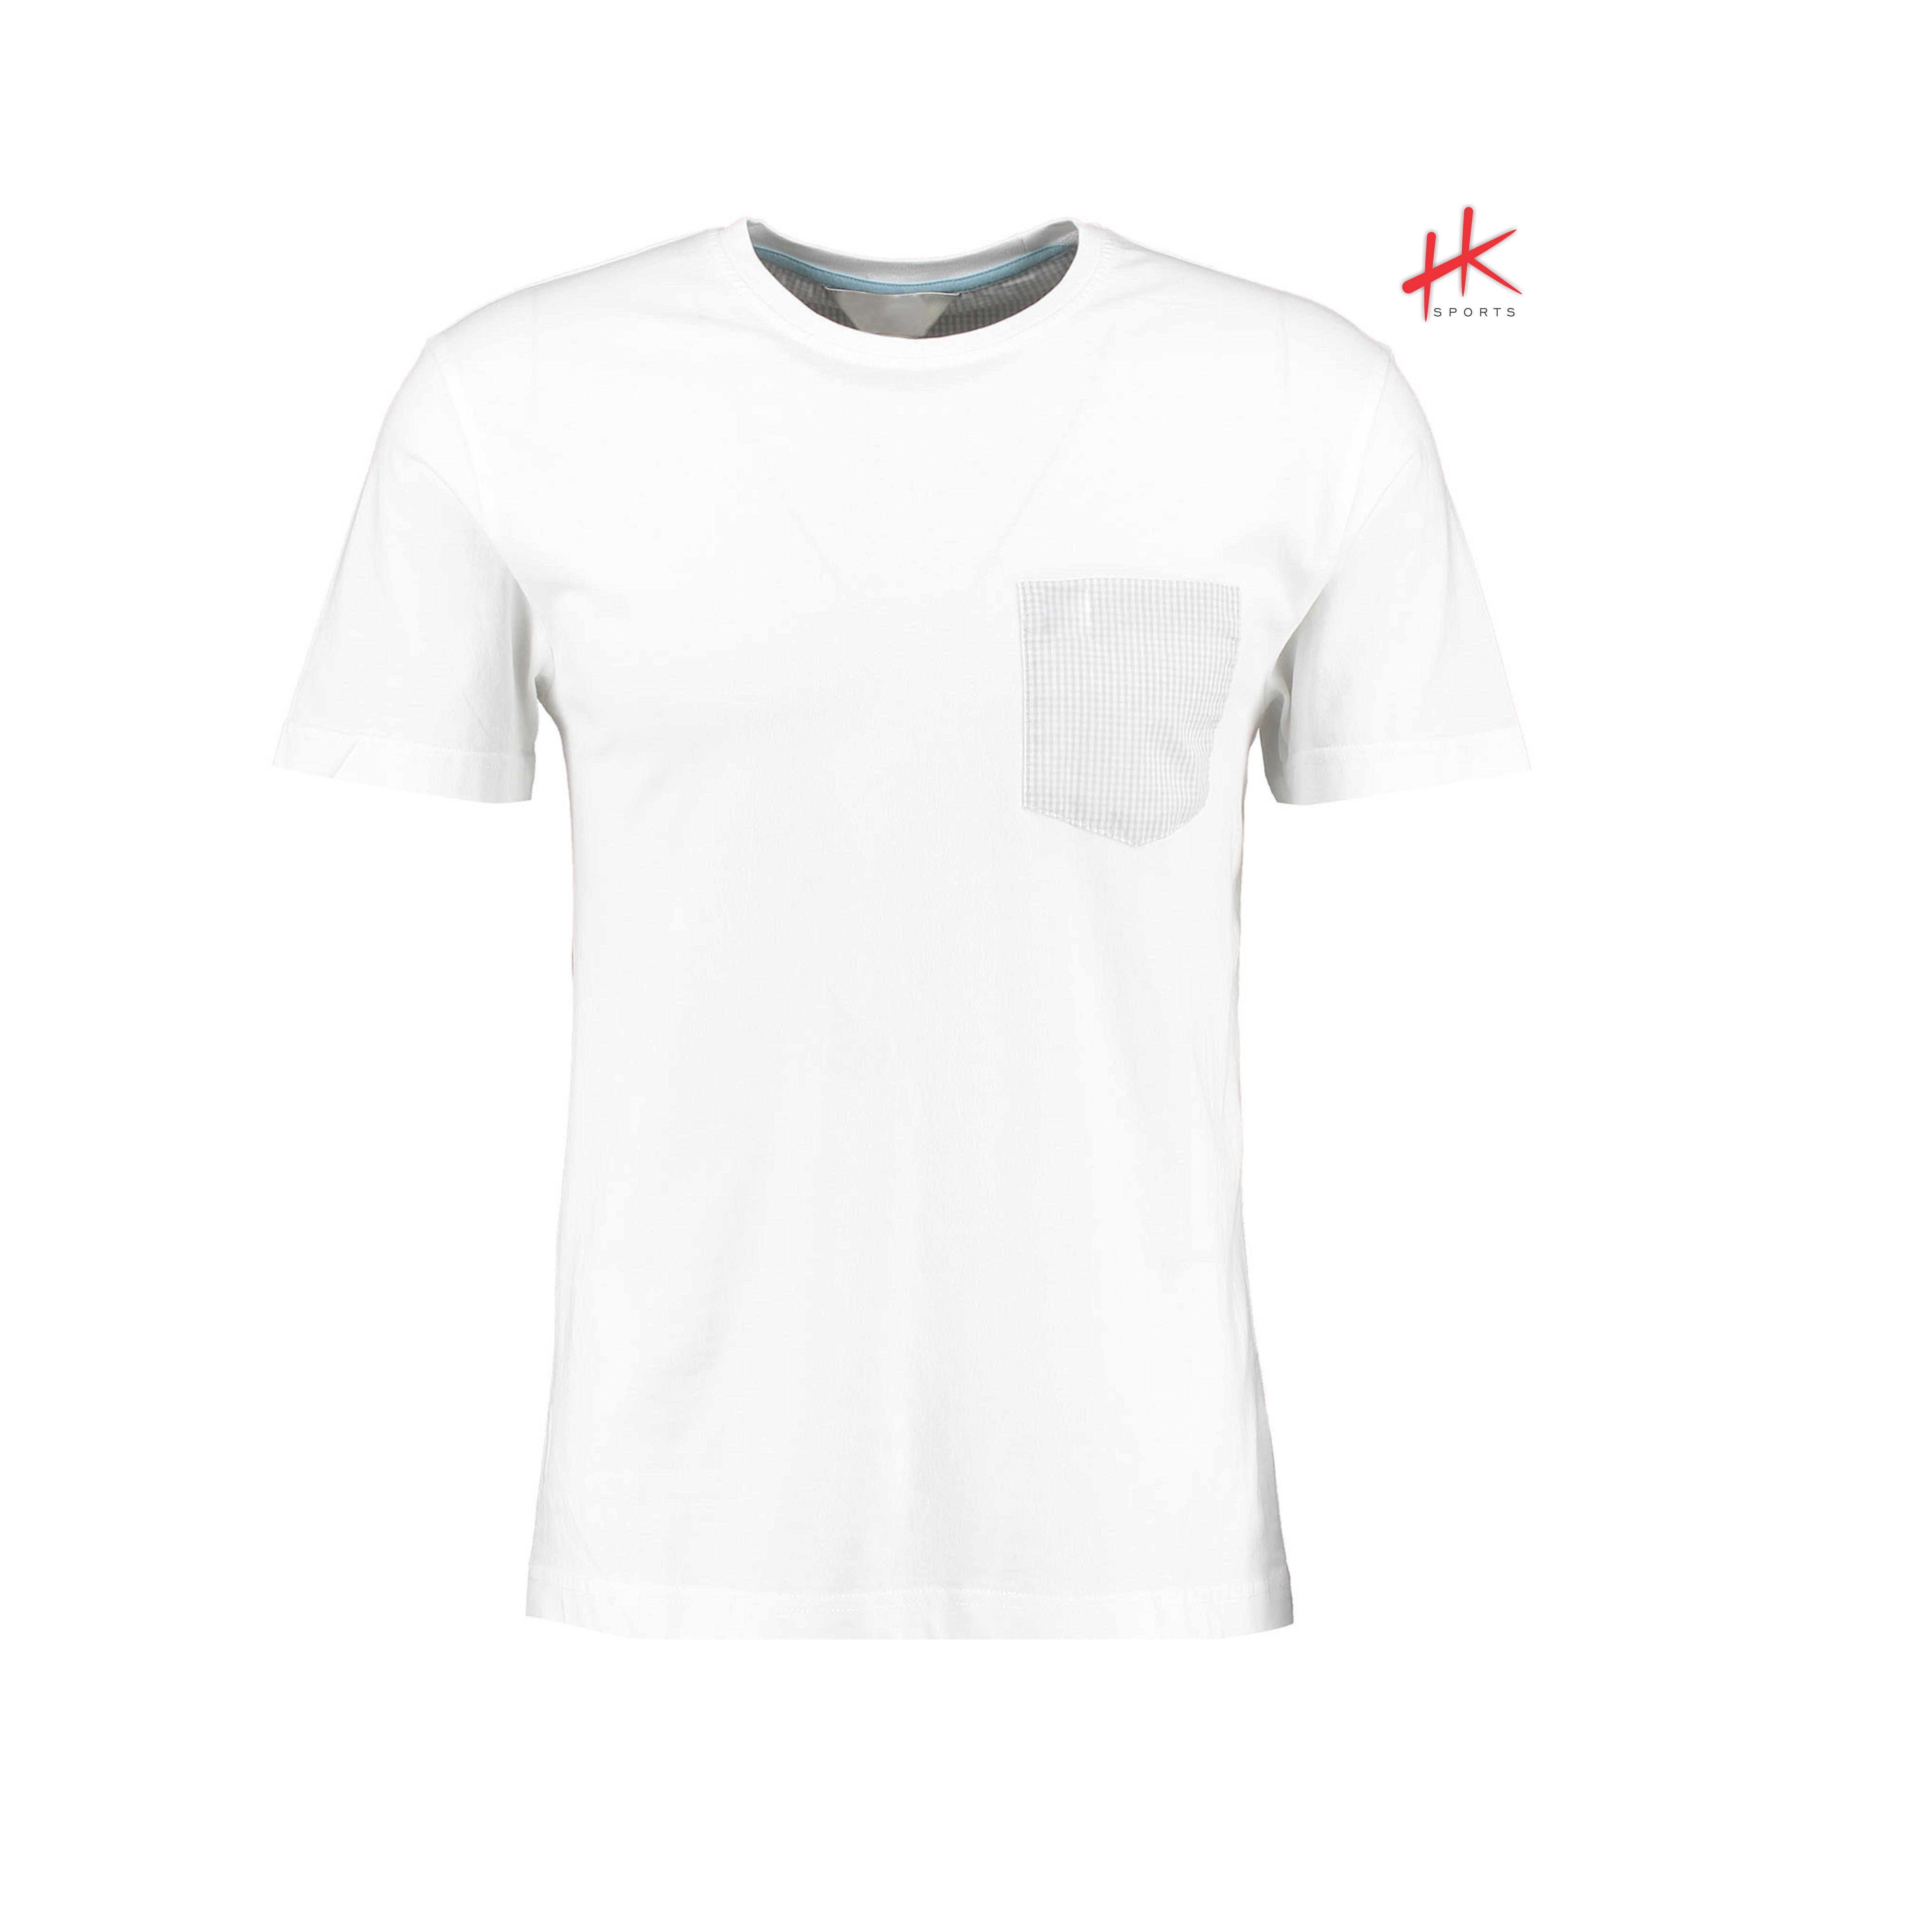 Mens Round Neck White T shirt Buy Camisetas Blancas